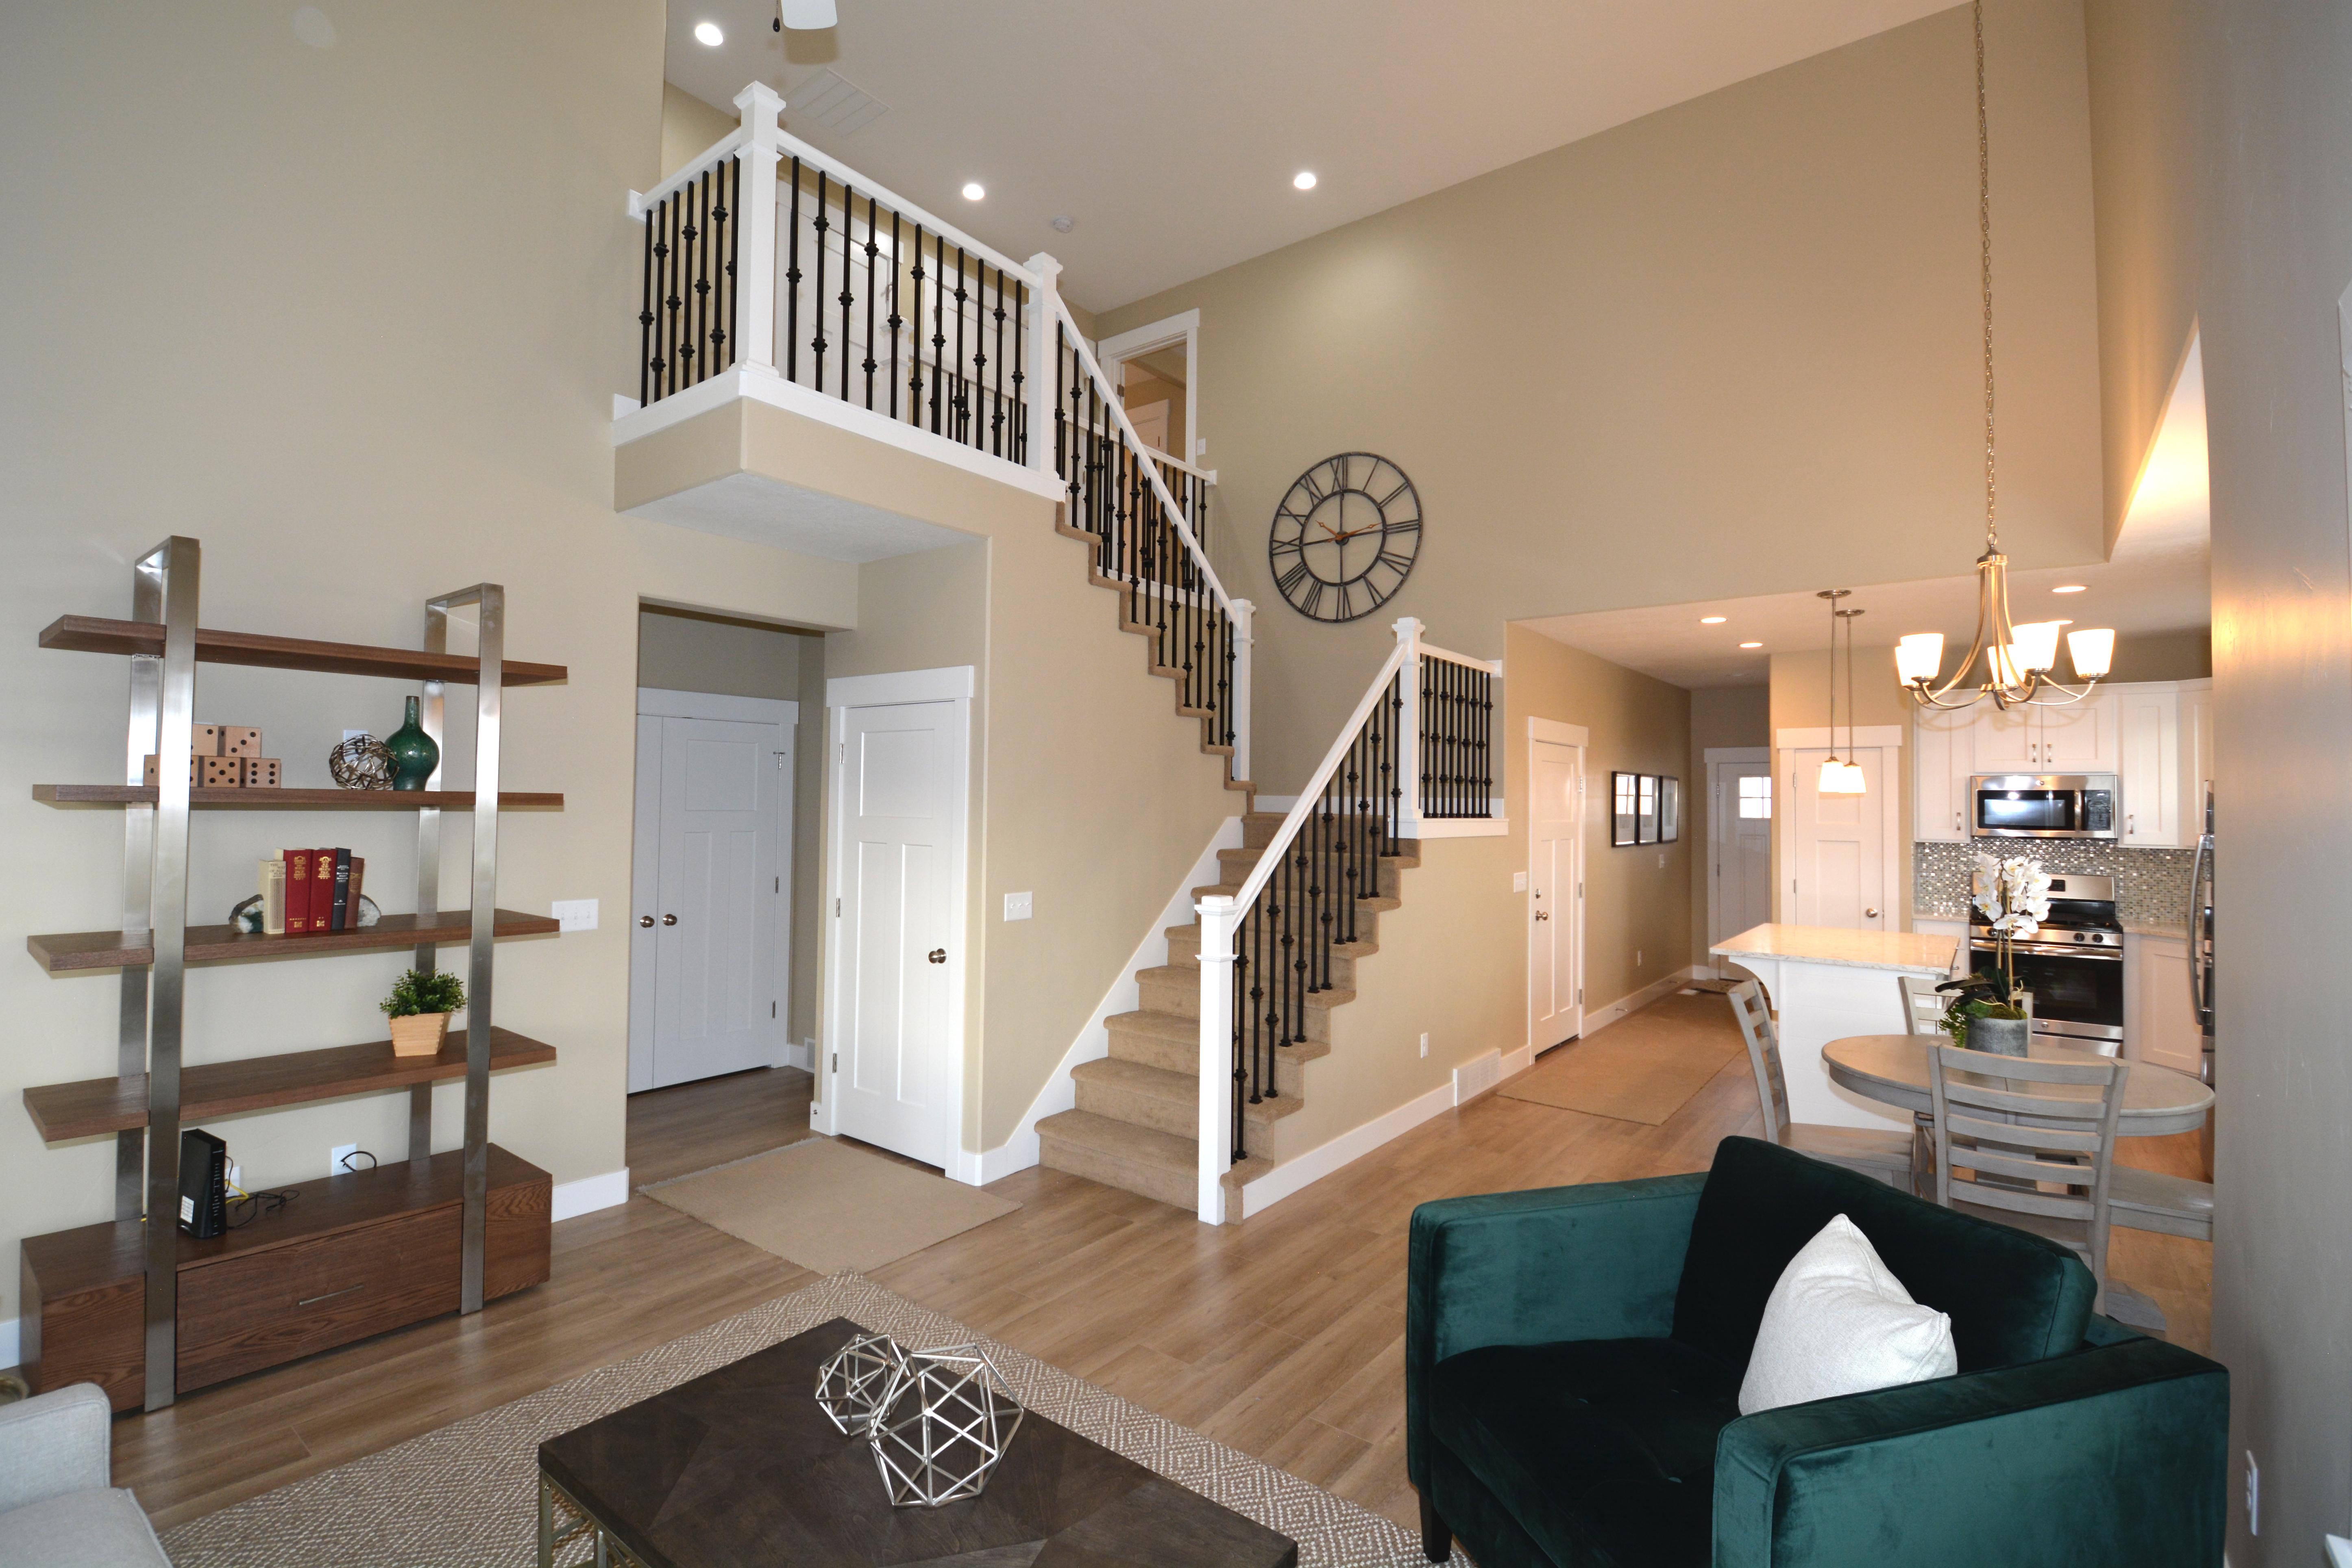 A Living area.jpg